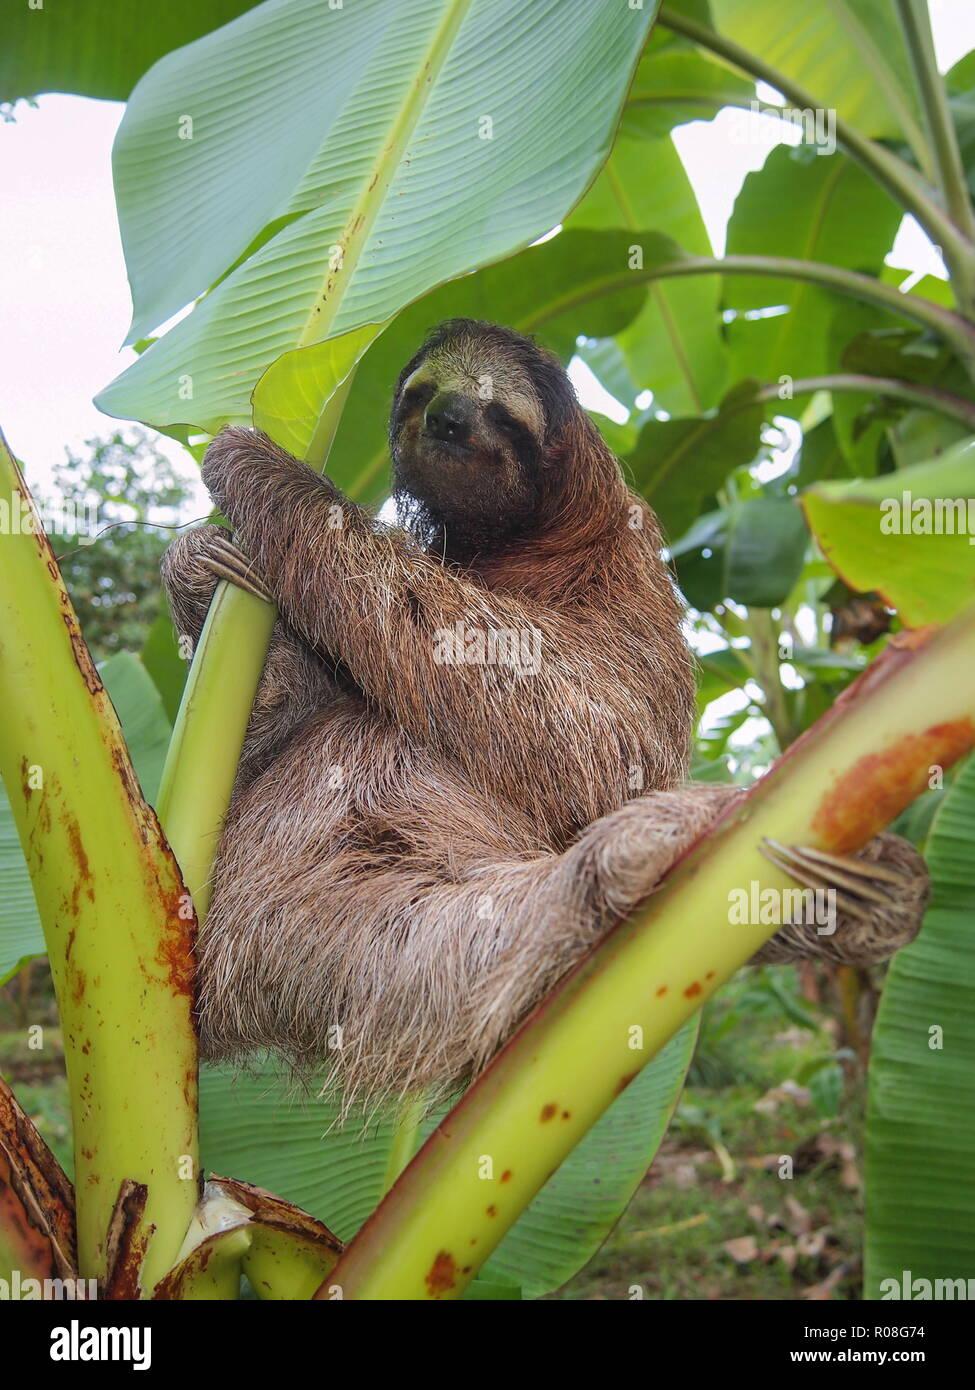 A three toed sloth Bradypus variegatus on a banana tree, Costa Rica, Central America Stock Photo